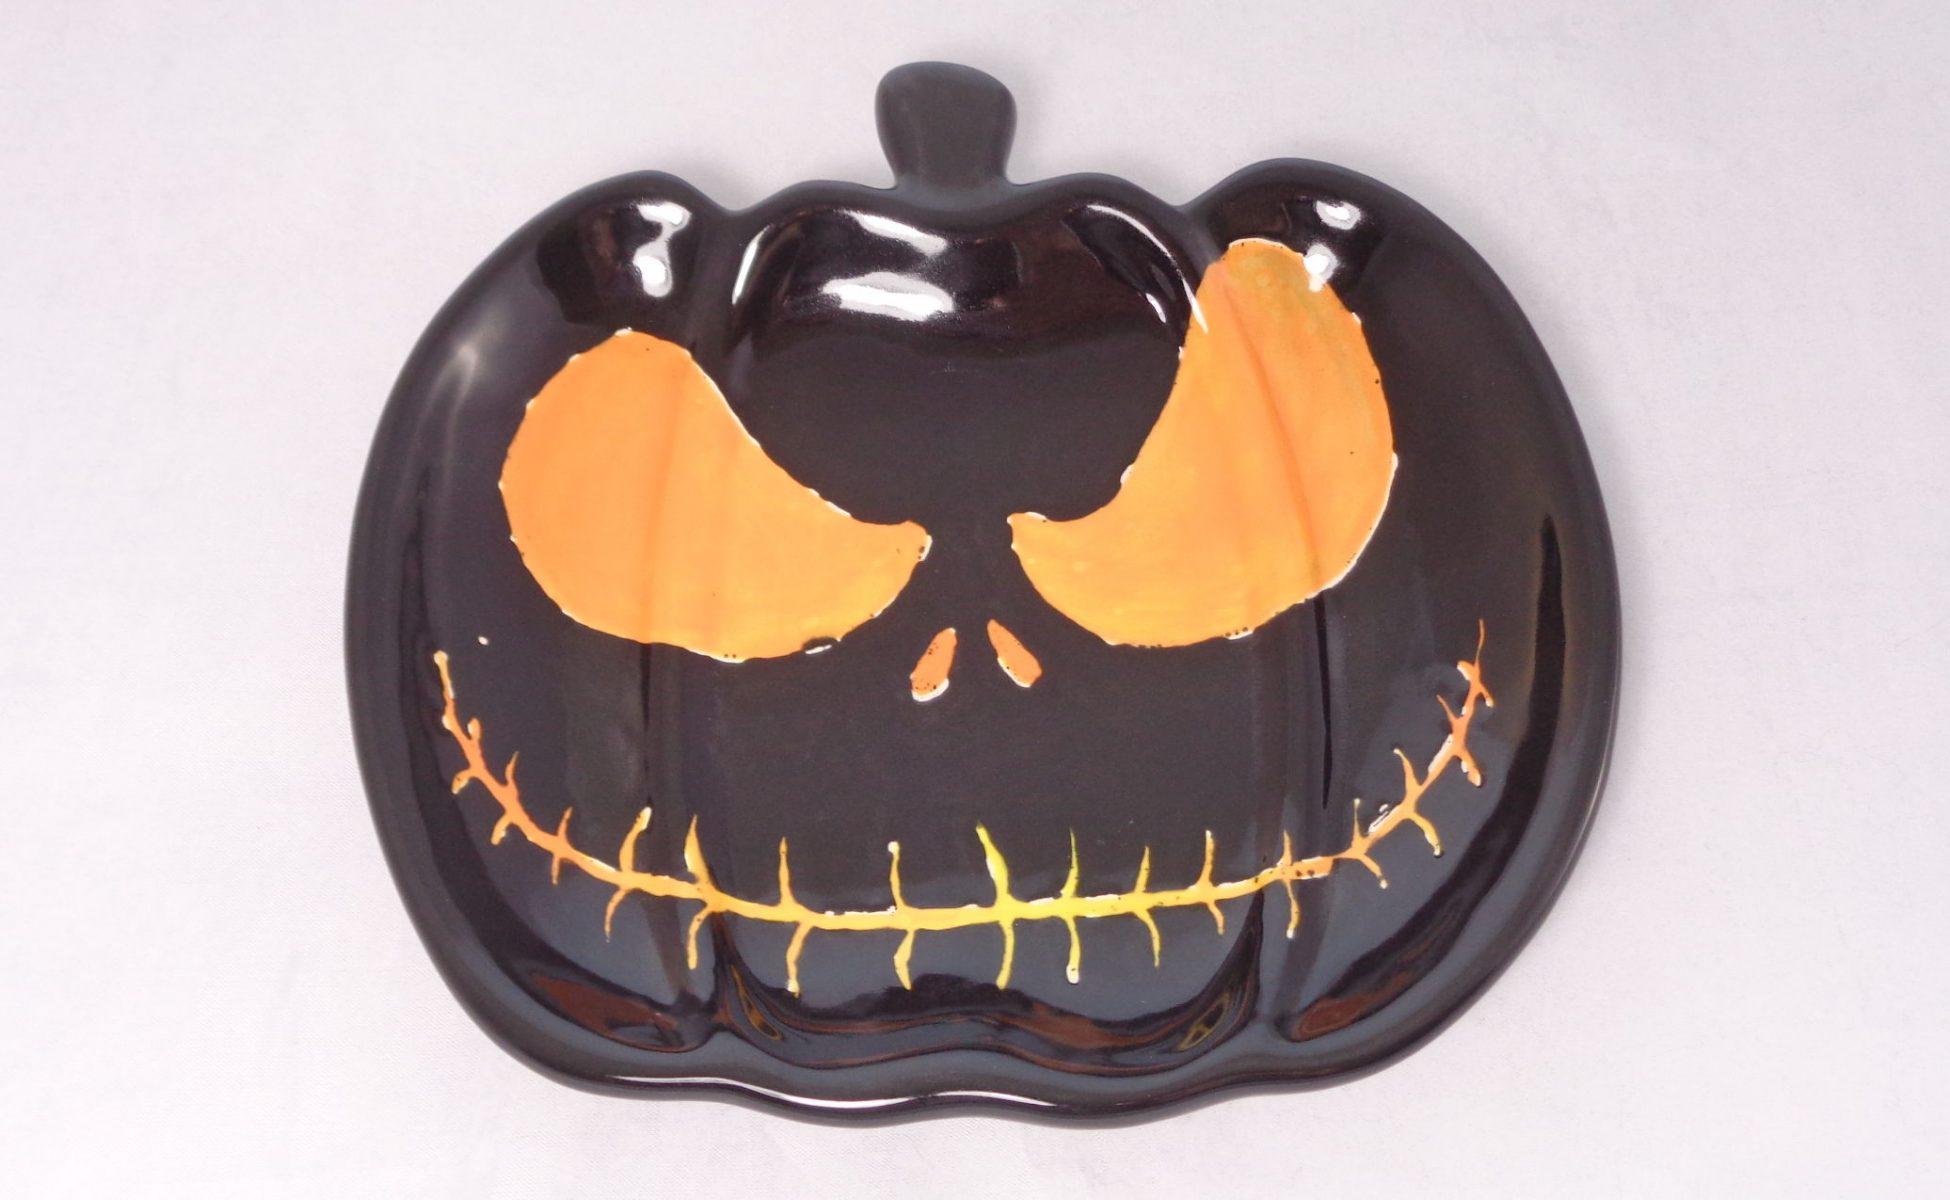 Bemalte Keramik Nightmare-Teller Halloween